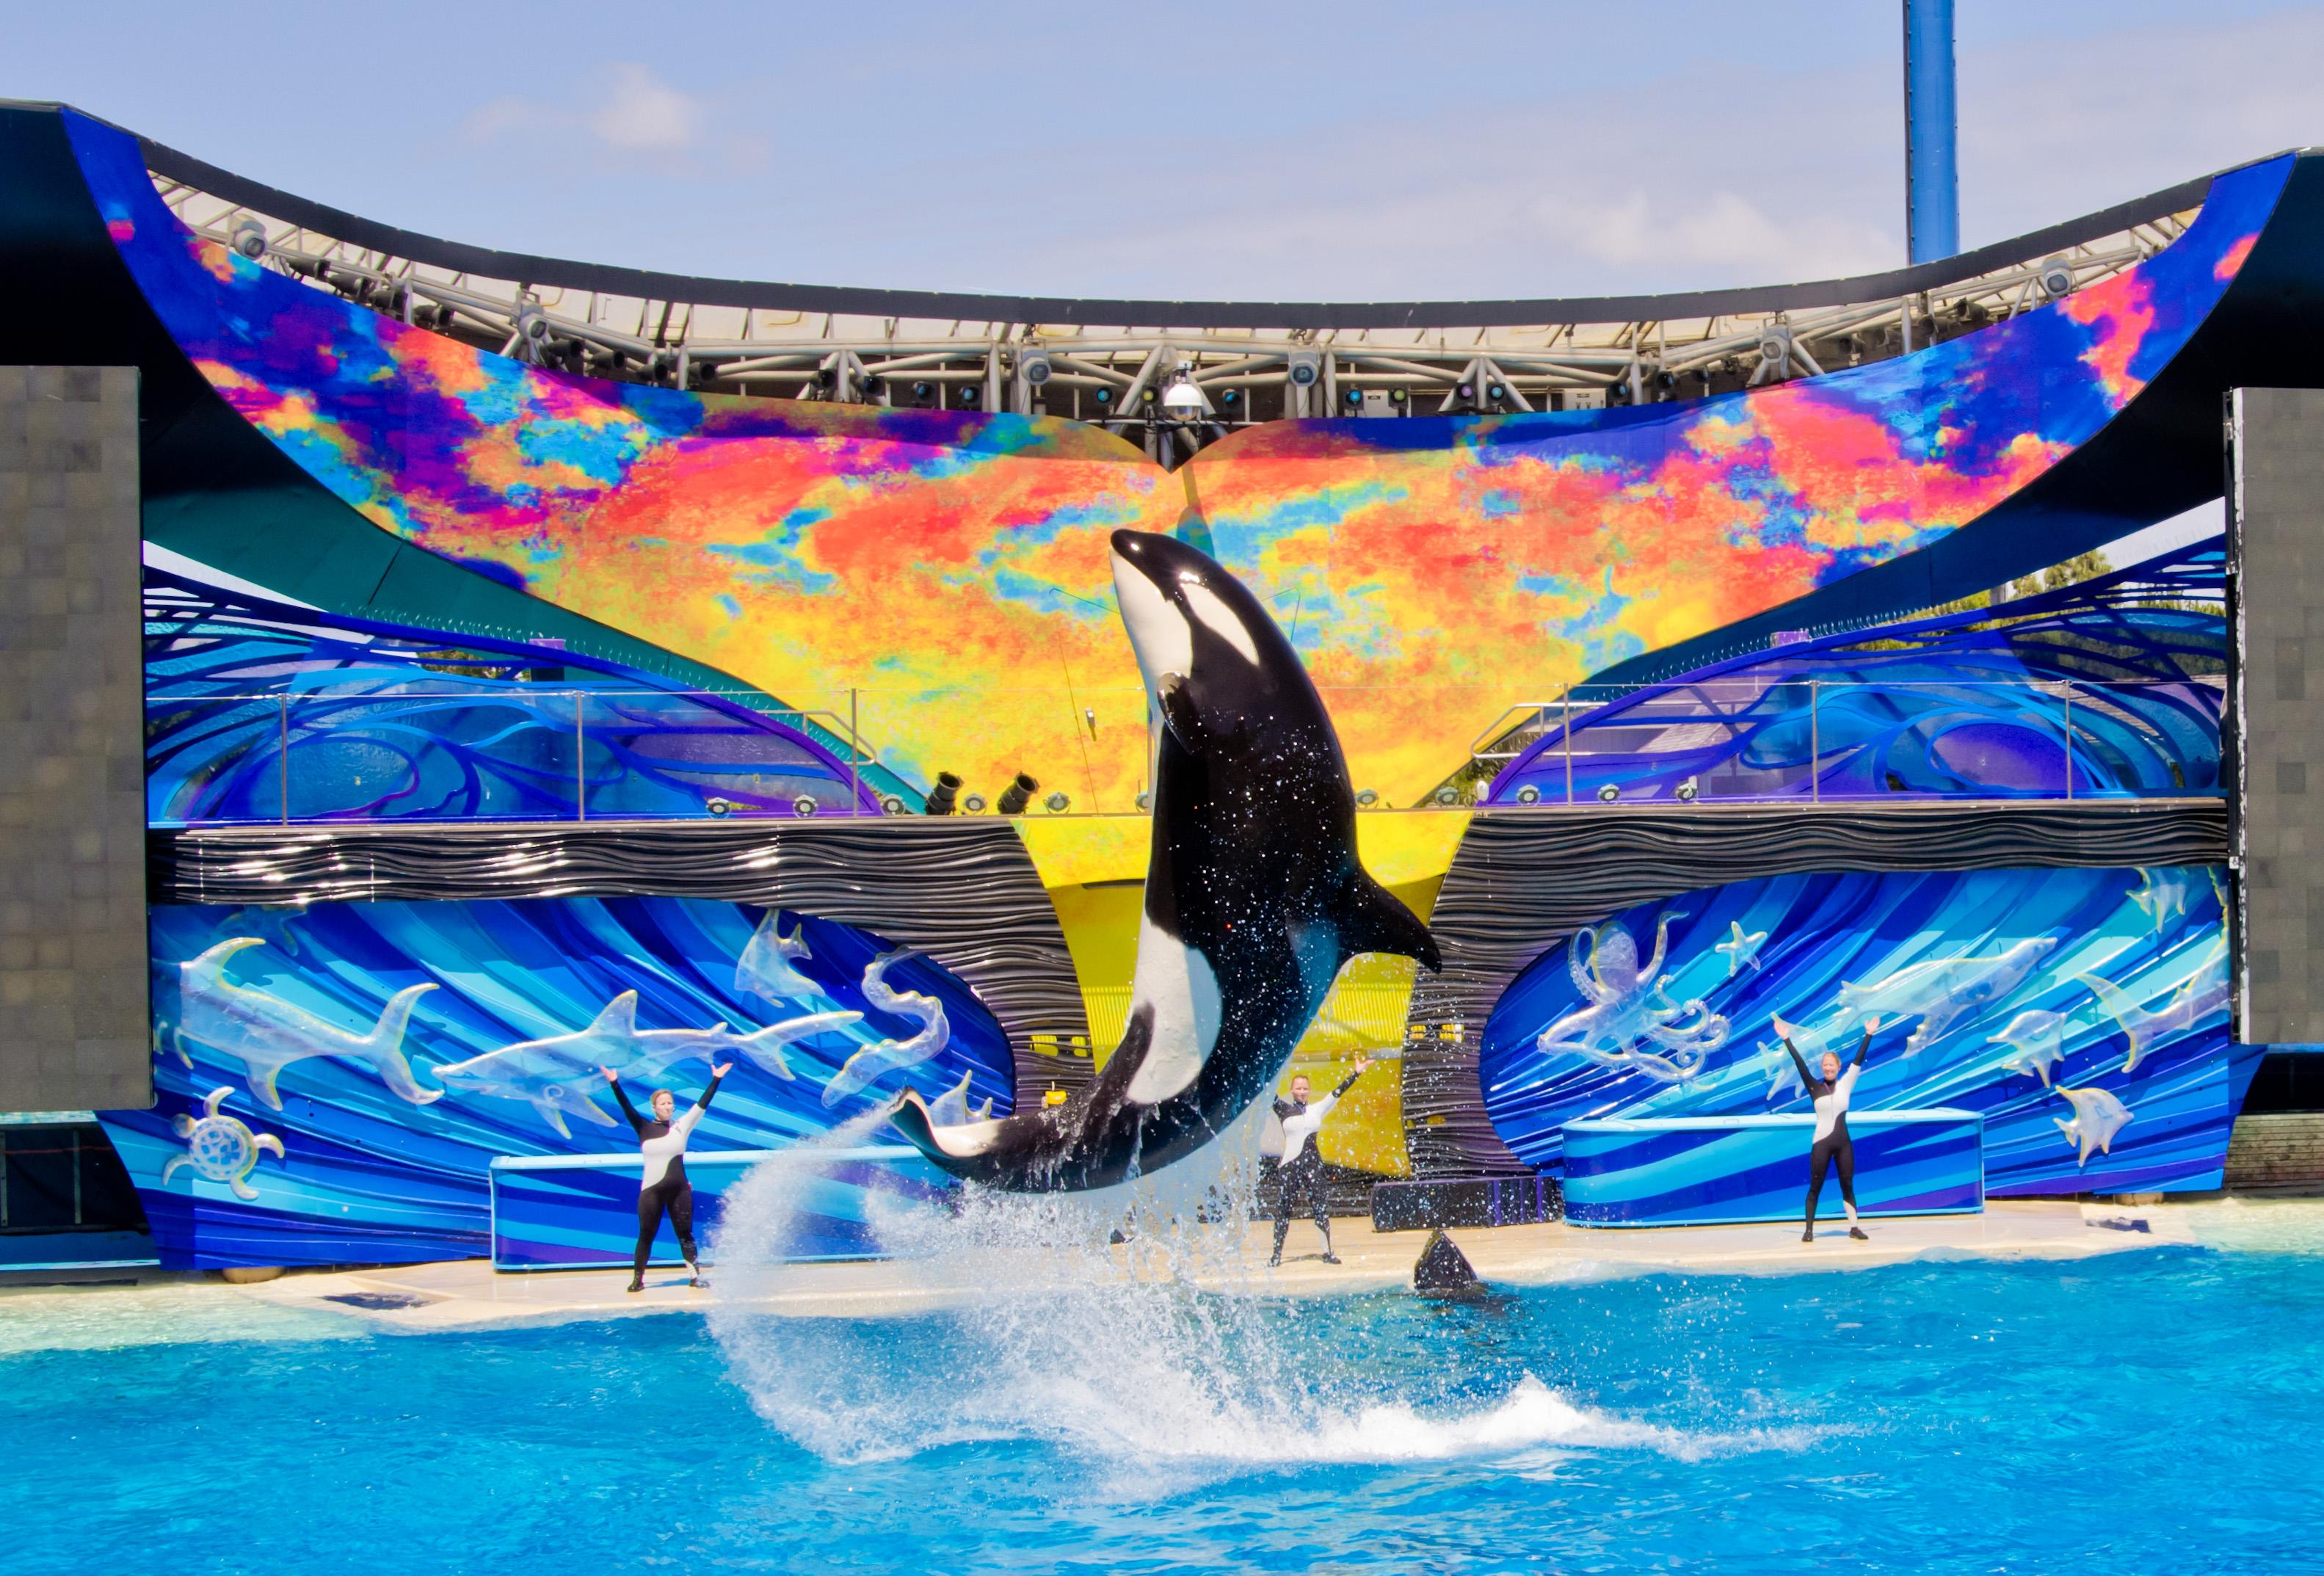 Killer Whale Hd Wallpaper File Seaworld San Diego5 Jpg